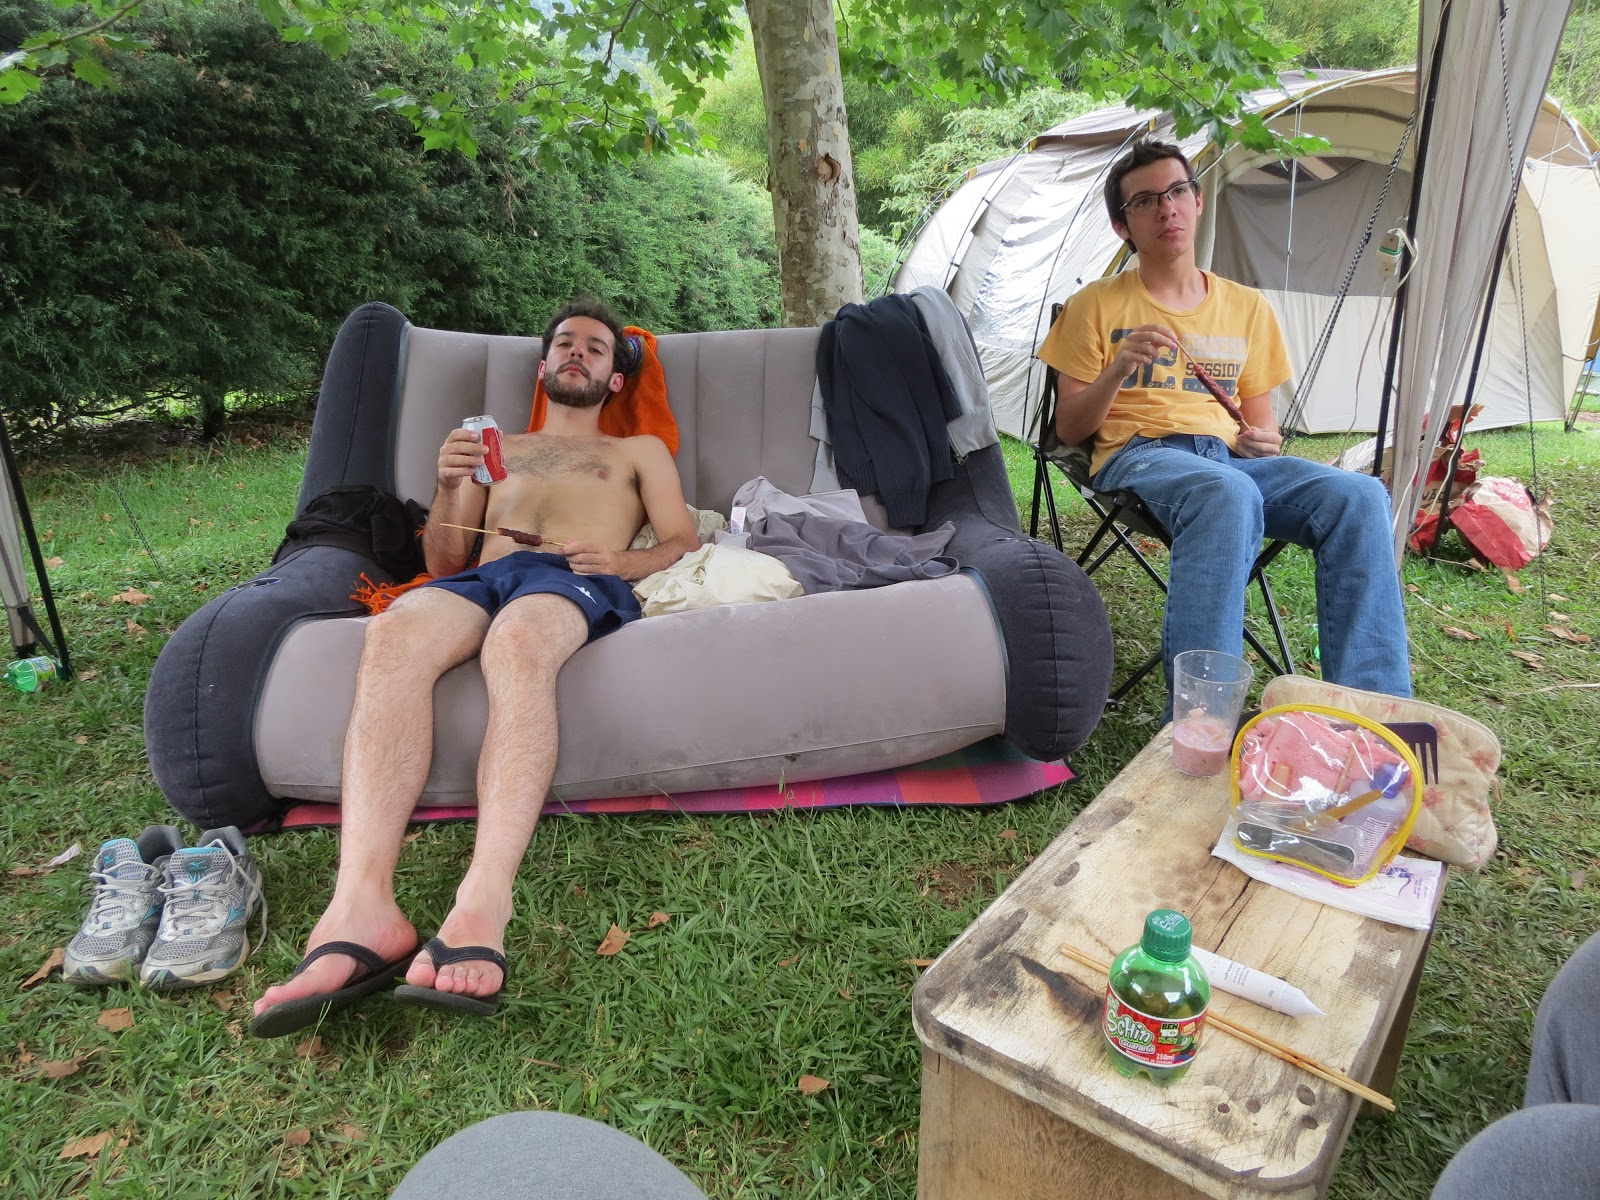 Sofa Camping Turner Leather Knockoff Podinha Club Sofá Inflável